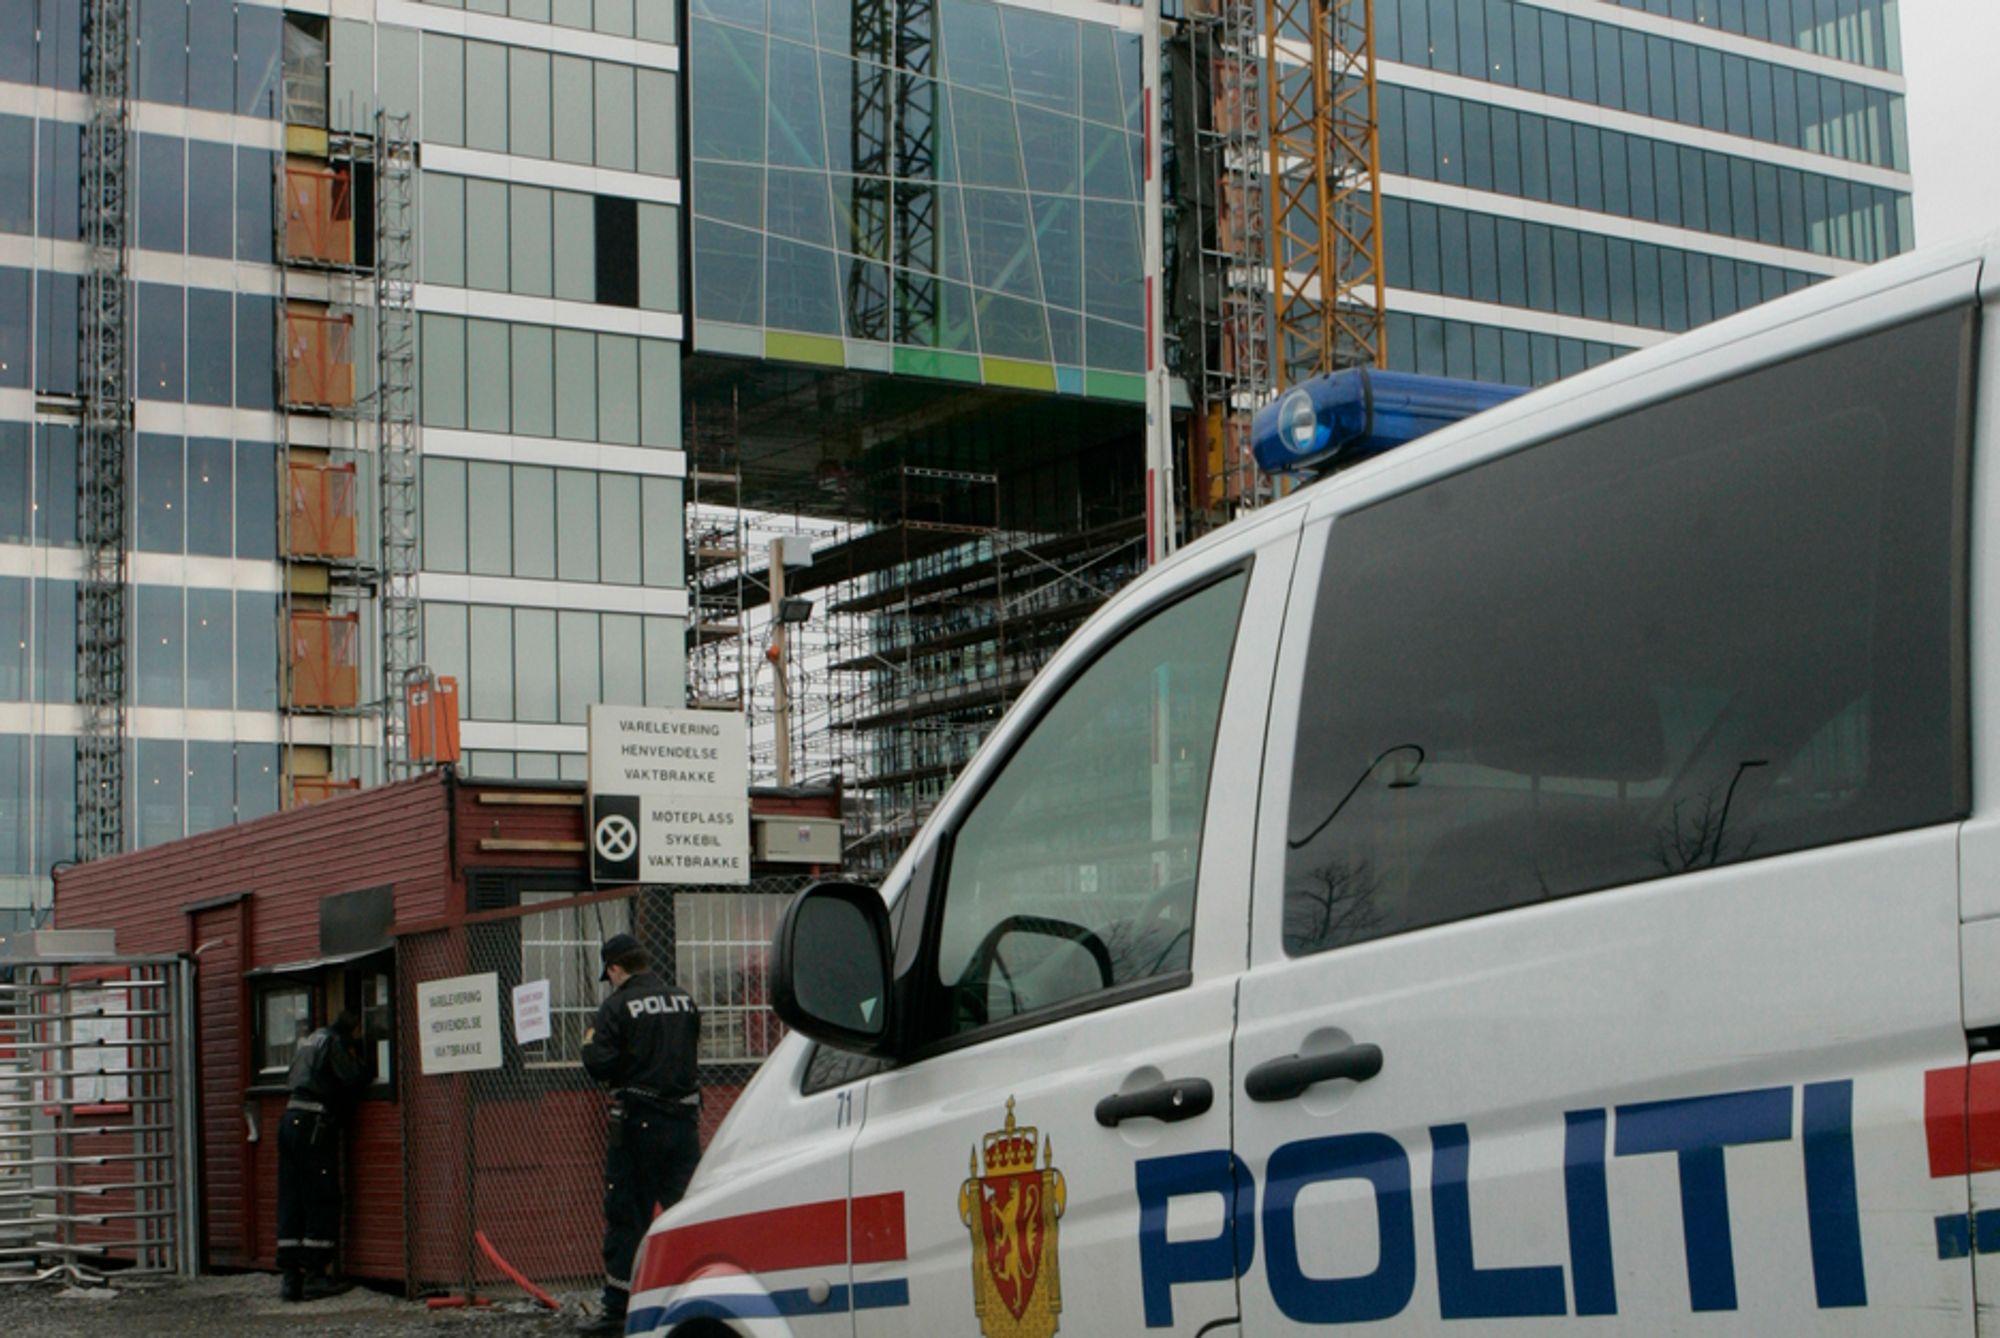 23. mars 2007 falt en bygningsarbeider ned i en sjakt og omkom på en byggeplass i Bispegata i Oslo sentrum. 39 personer omkom i arbeidsulykker her i landet i 2007.